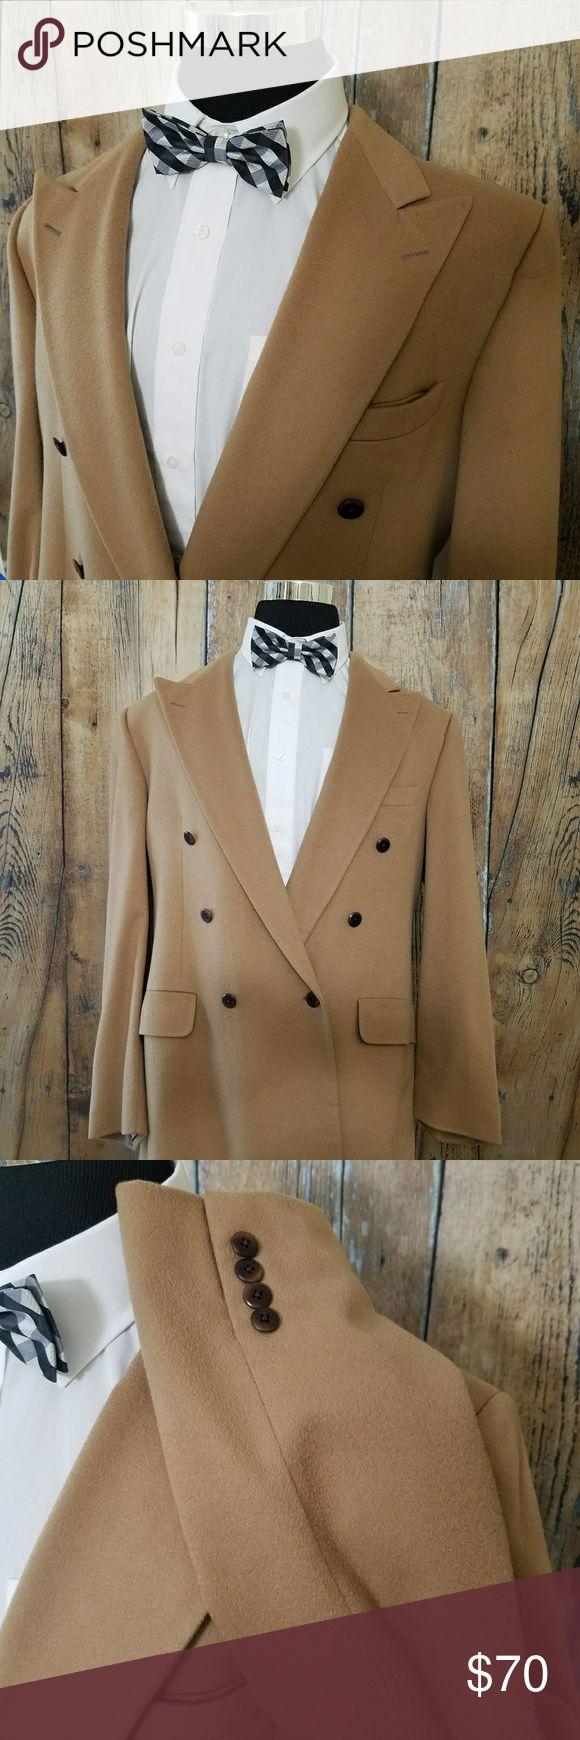 Nordstrom Cashmere Sport Coat 48R Good Used Condition Nordstrom Suits & Blazers Sport Coats & Blazers